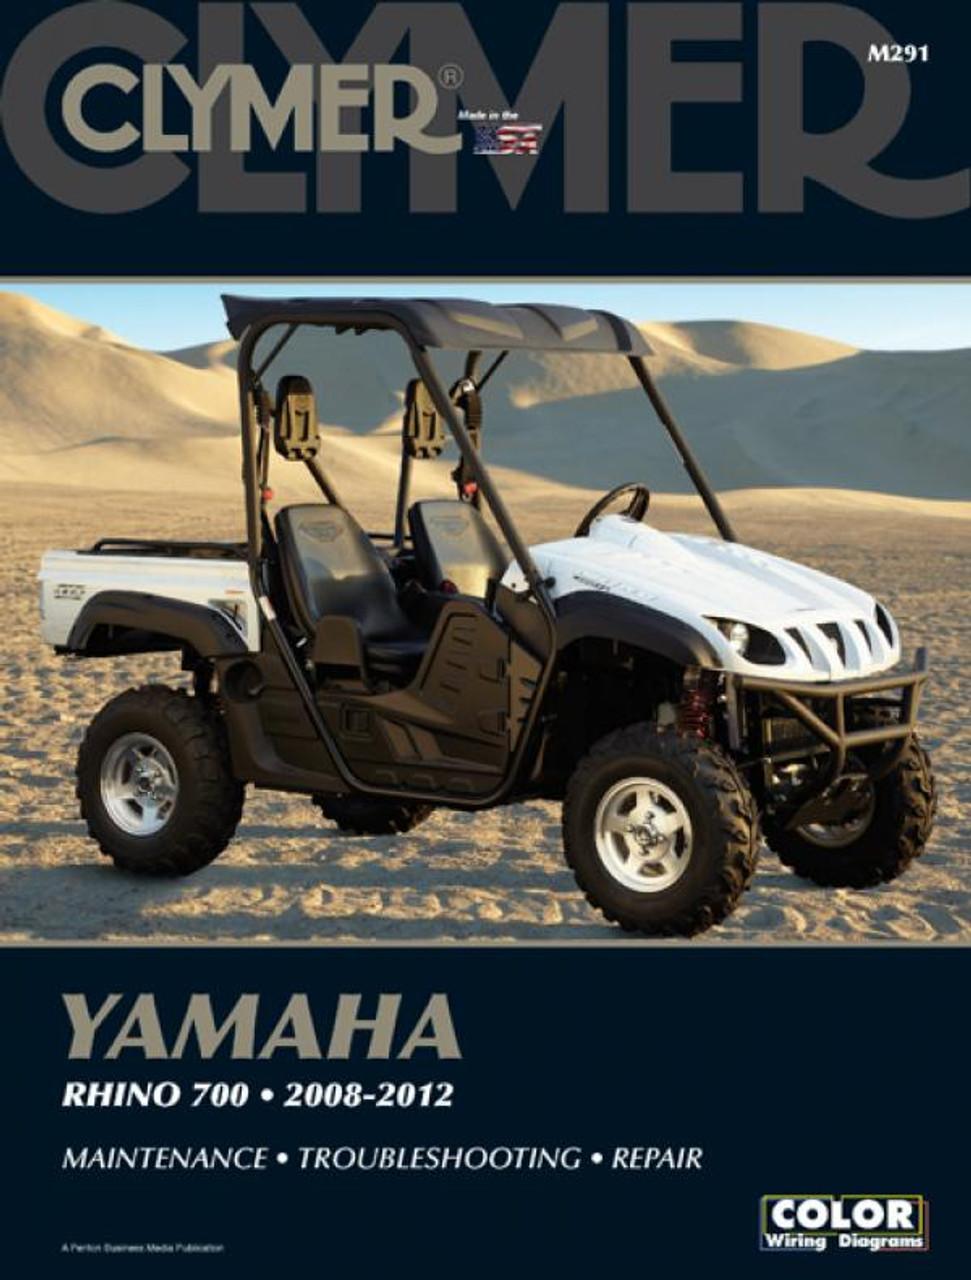 hight resolution of yamaha rhino 700 atvs 2008 2012 clymer workshop manual yamaha rhino 700 vacuum diagram